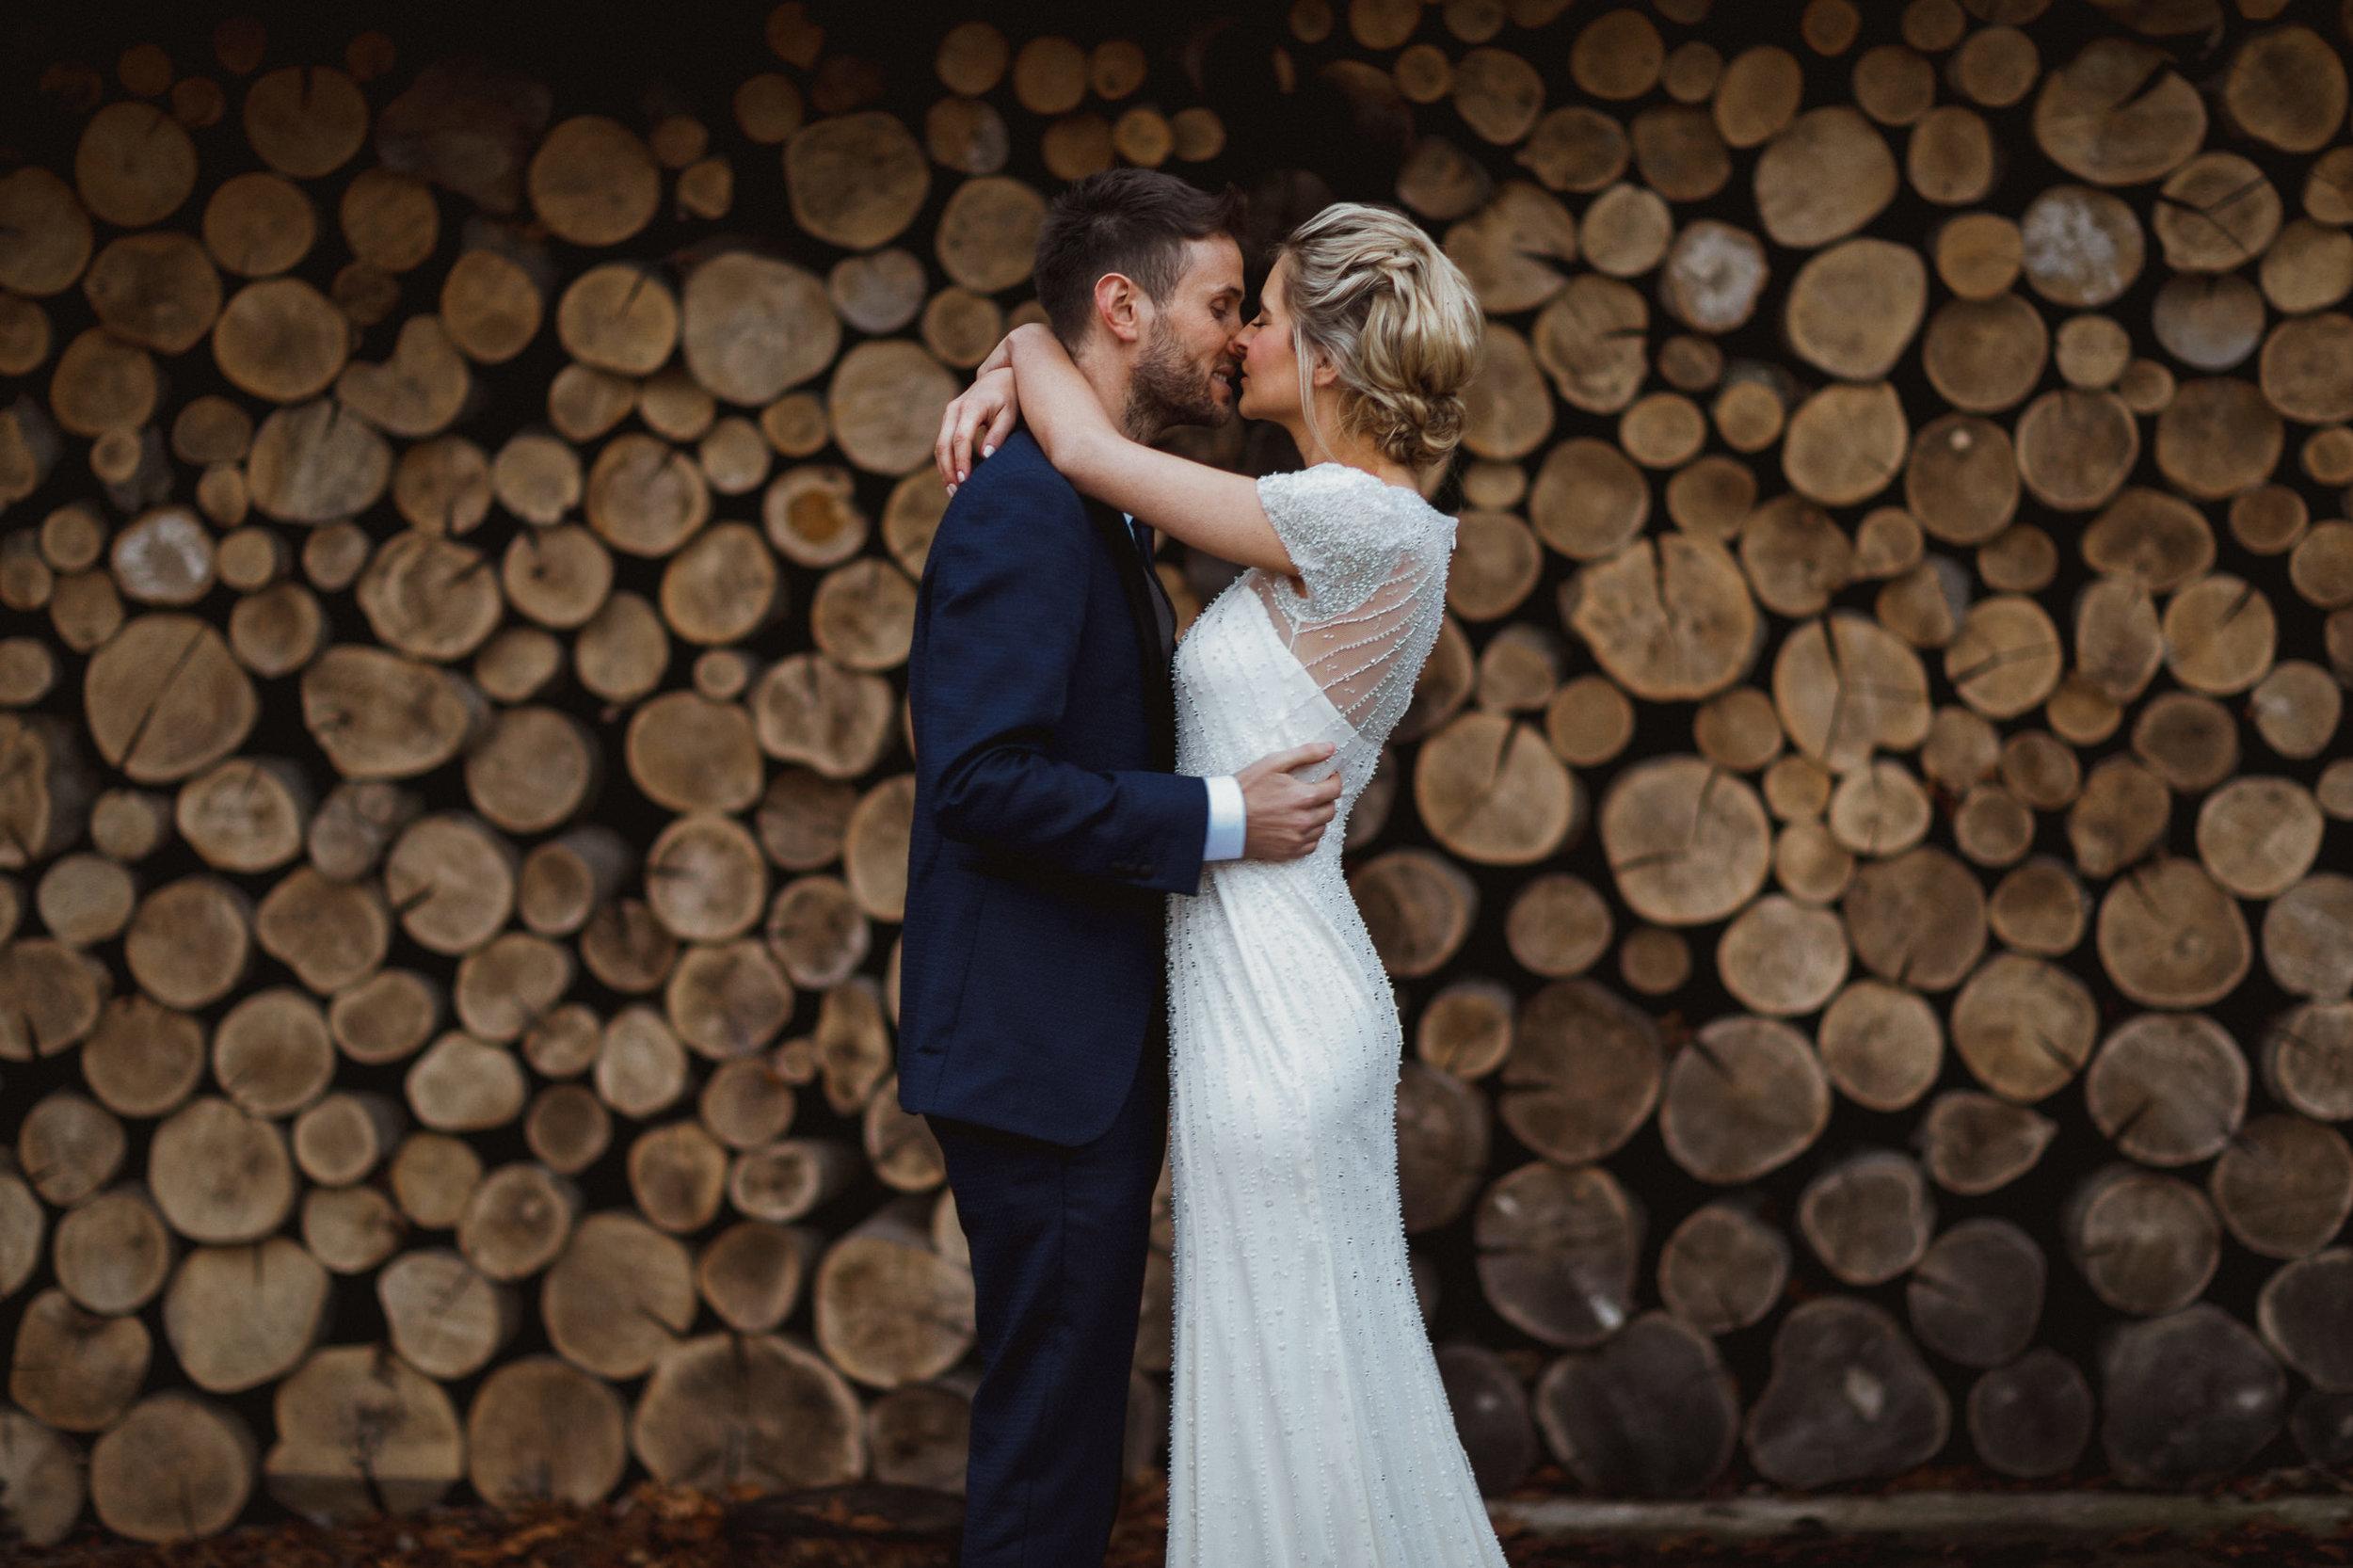 London_wedding_photographer_gione_da_silva_carelle_paul172.jpg